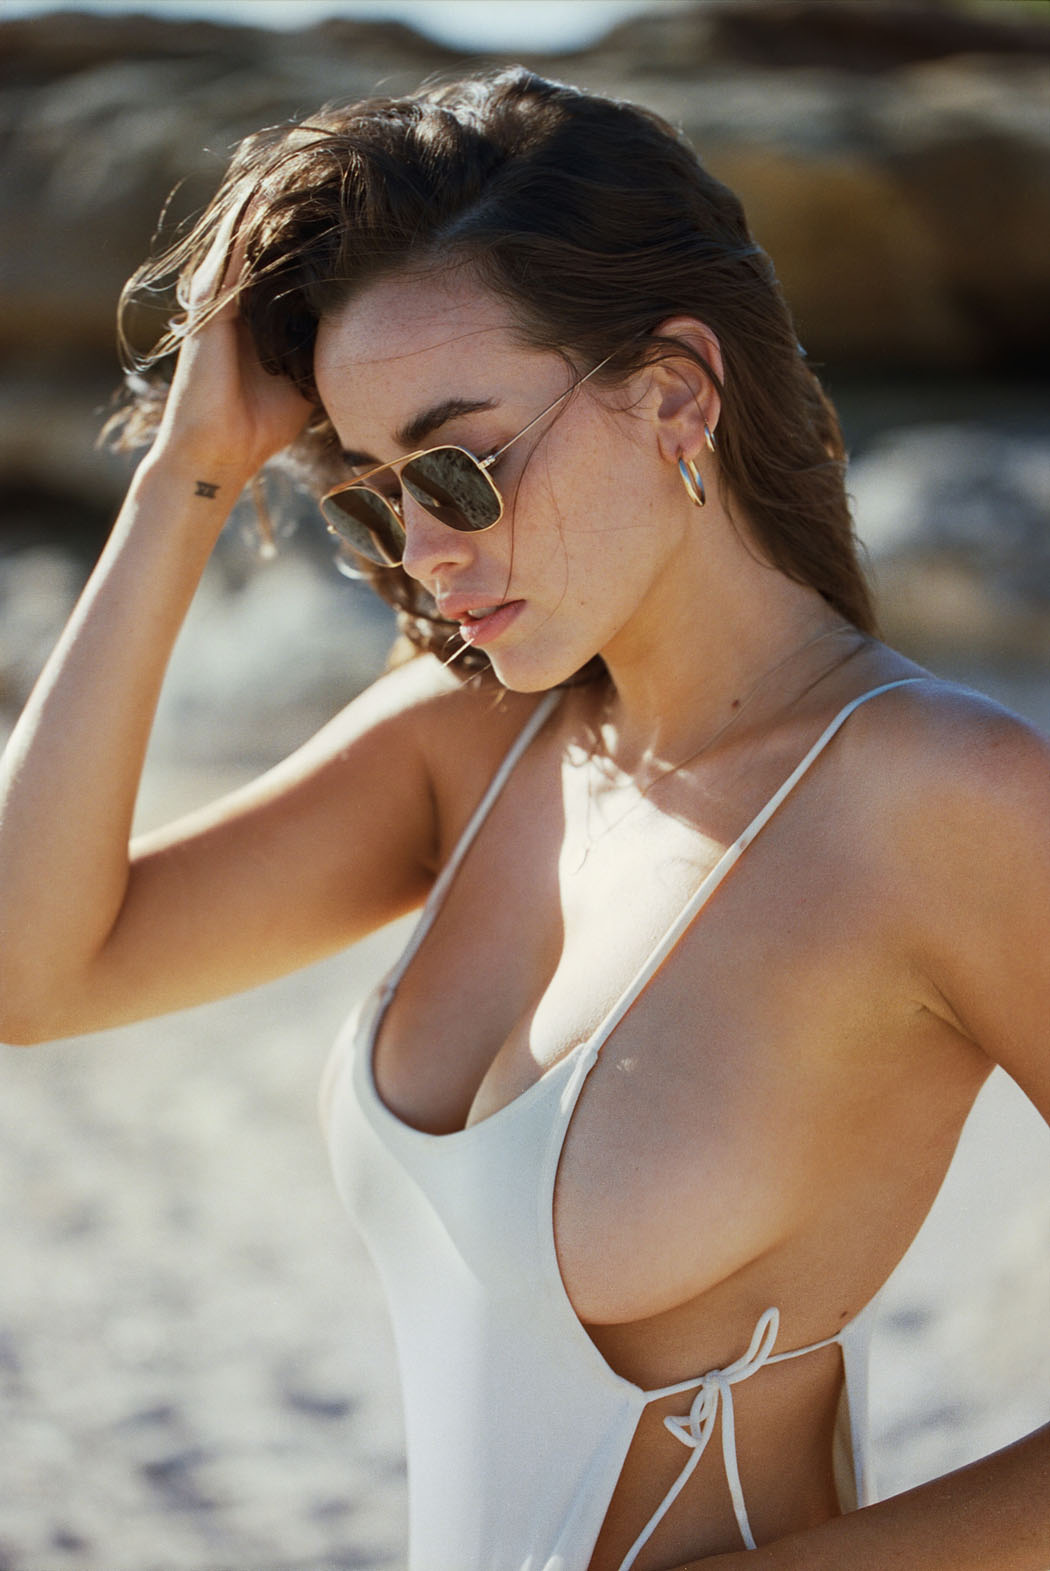 sarah-stephens-seaside-erotic-photo-by-cameron-mackie-09